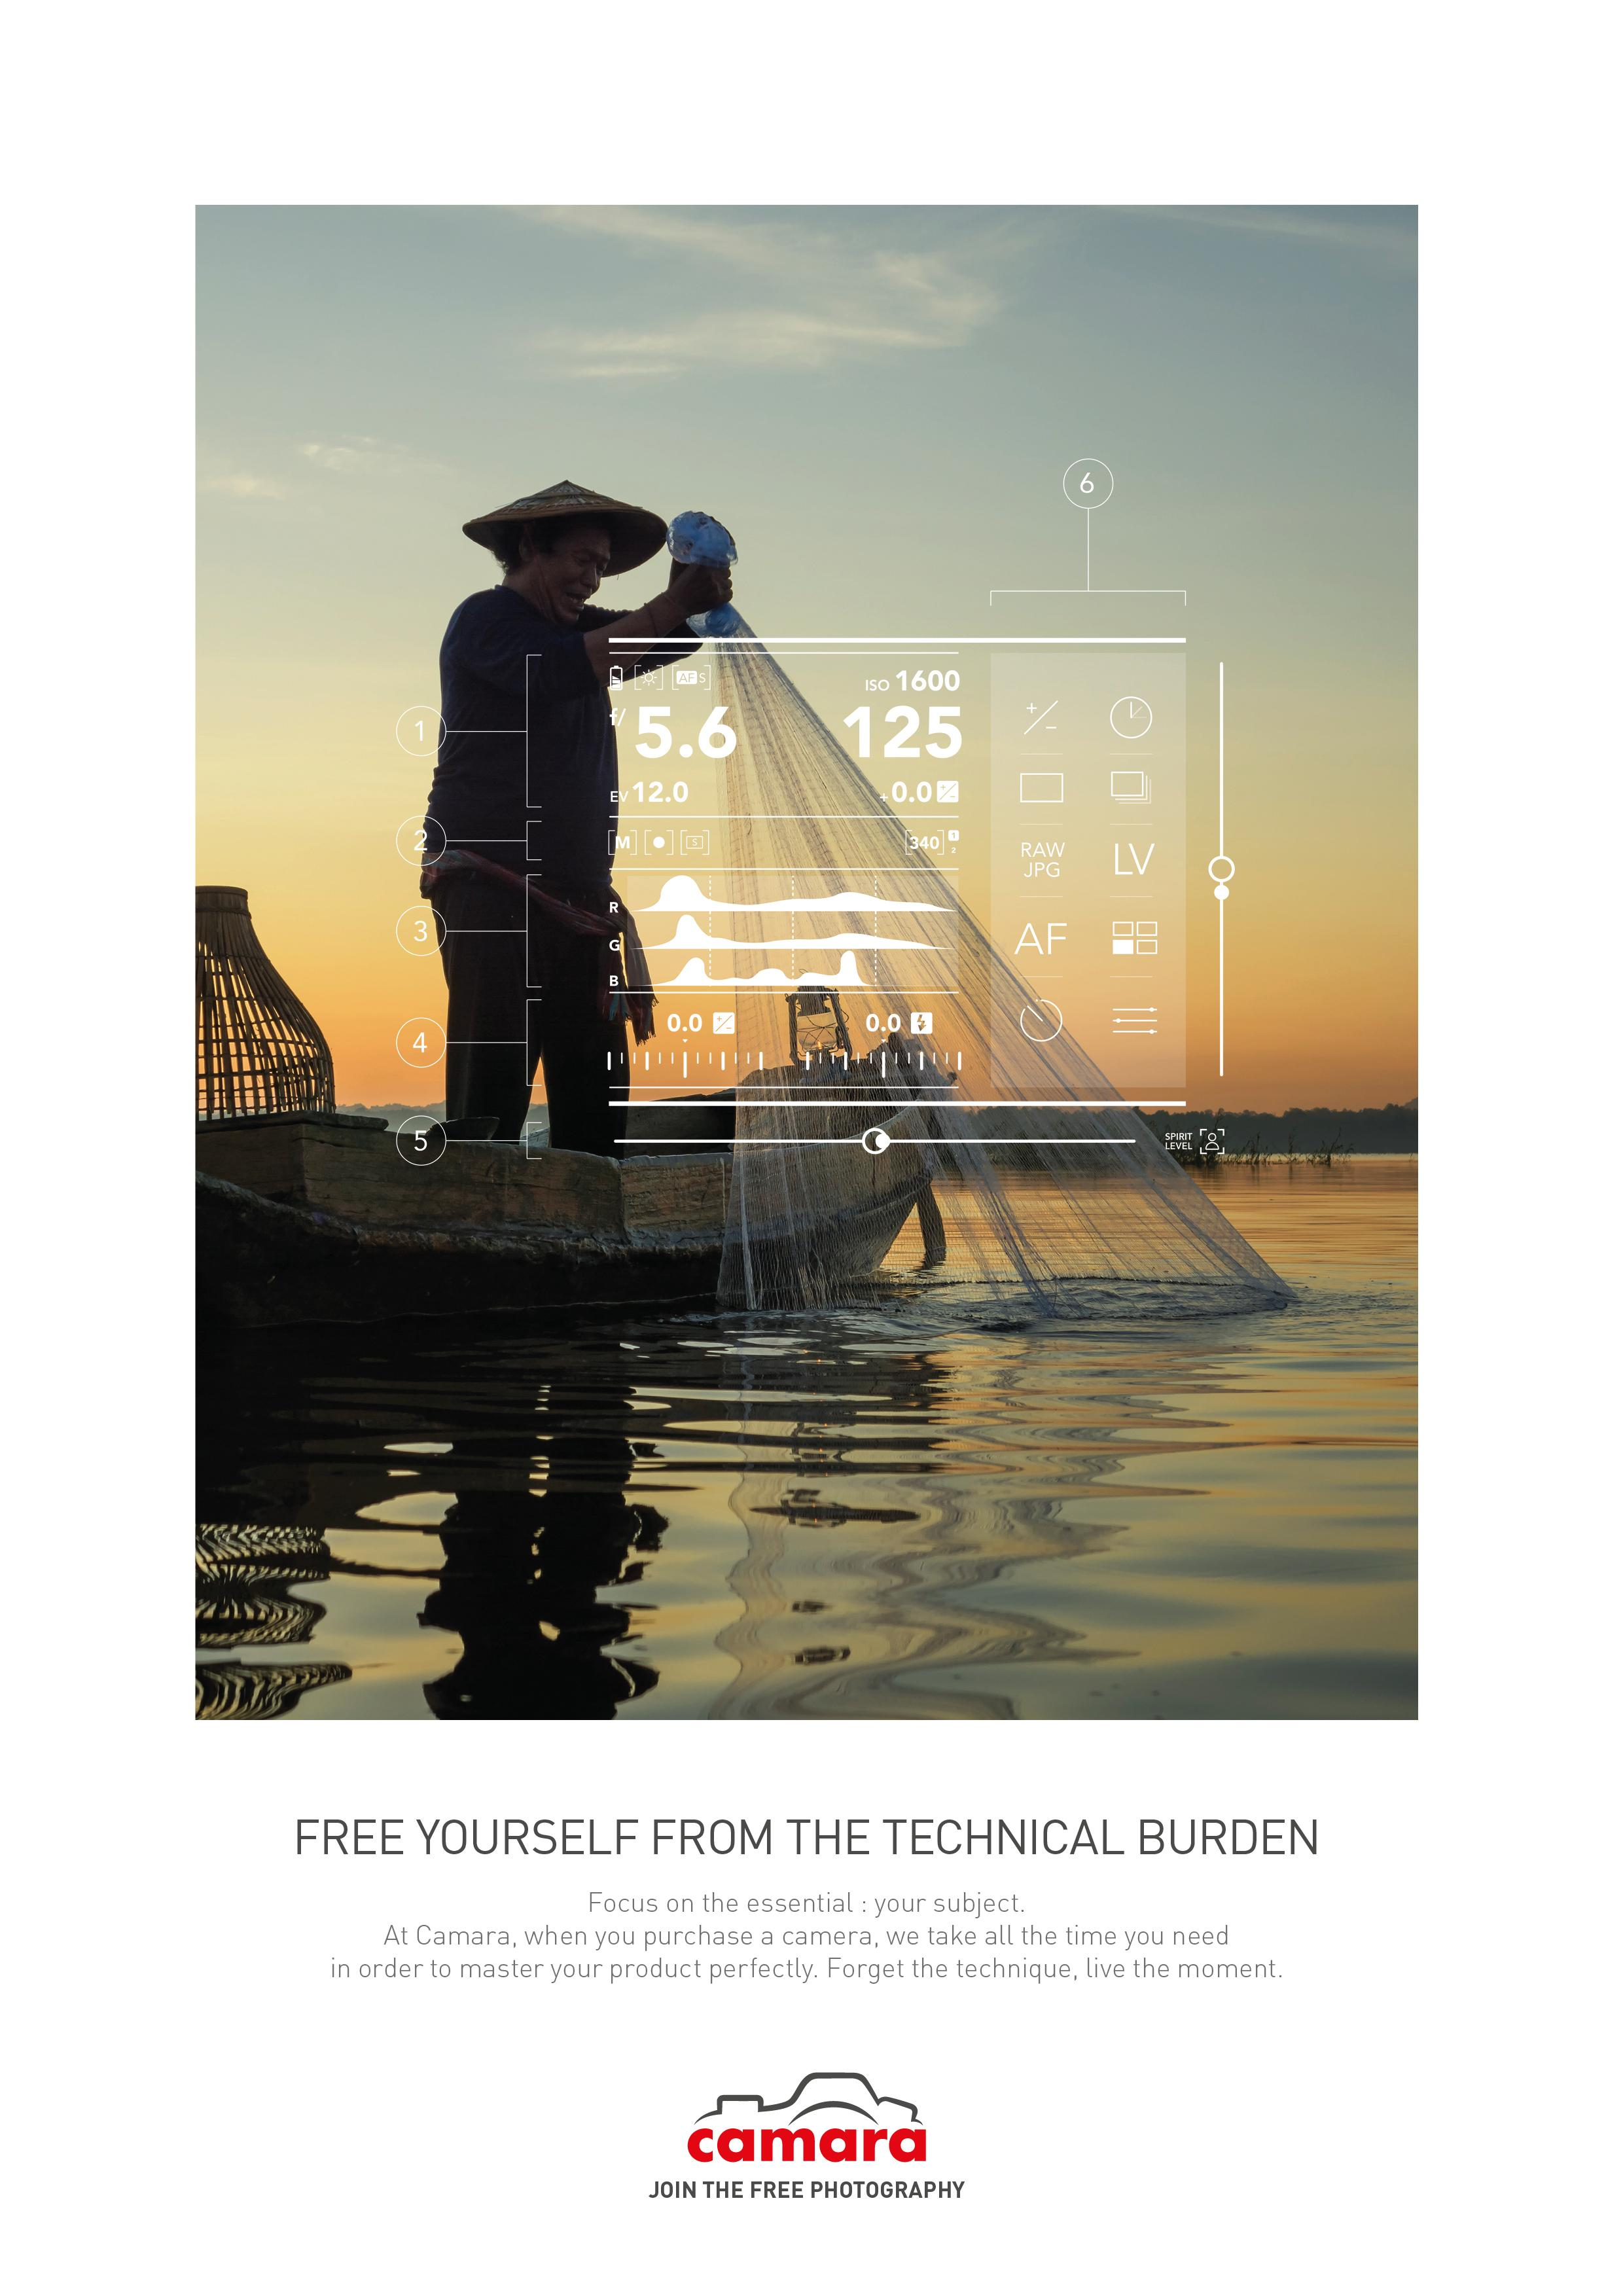 Camara Print Ad - The Fisherman